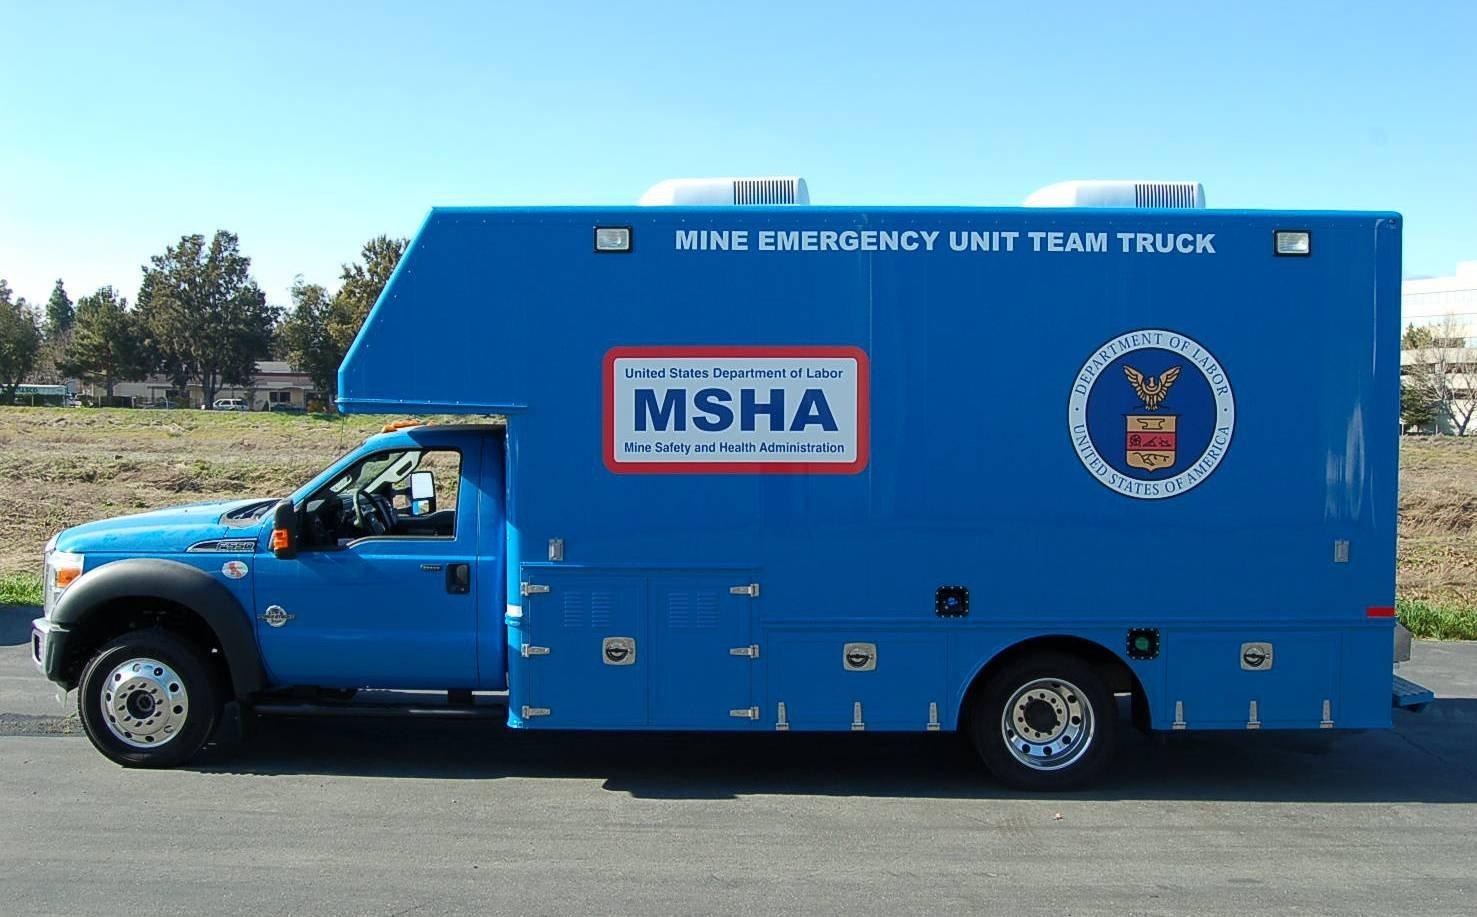 Emergency Team Truck